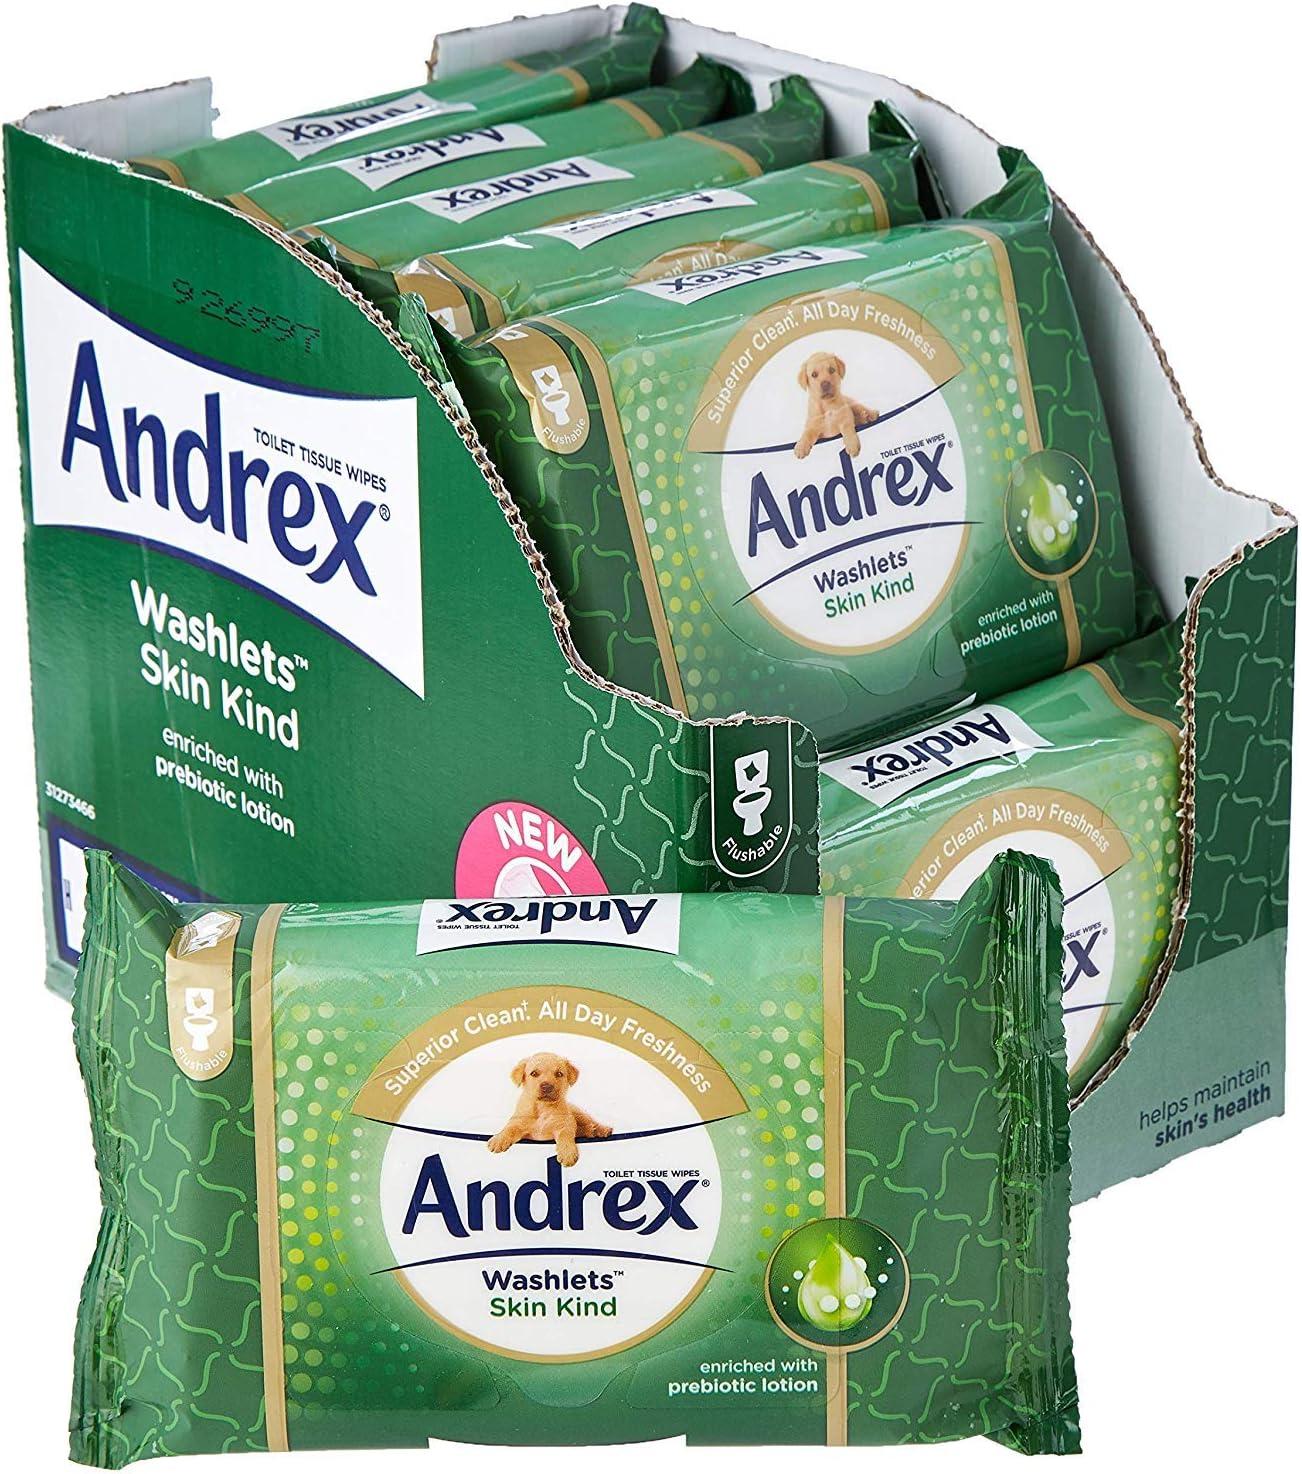 Fragrance Free Gentle Clean Toilet Tissue Wet Wipes Washlets Flushable Tissue Wipes Multi Pack